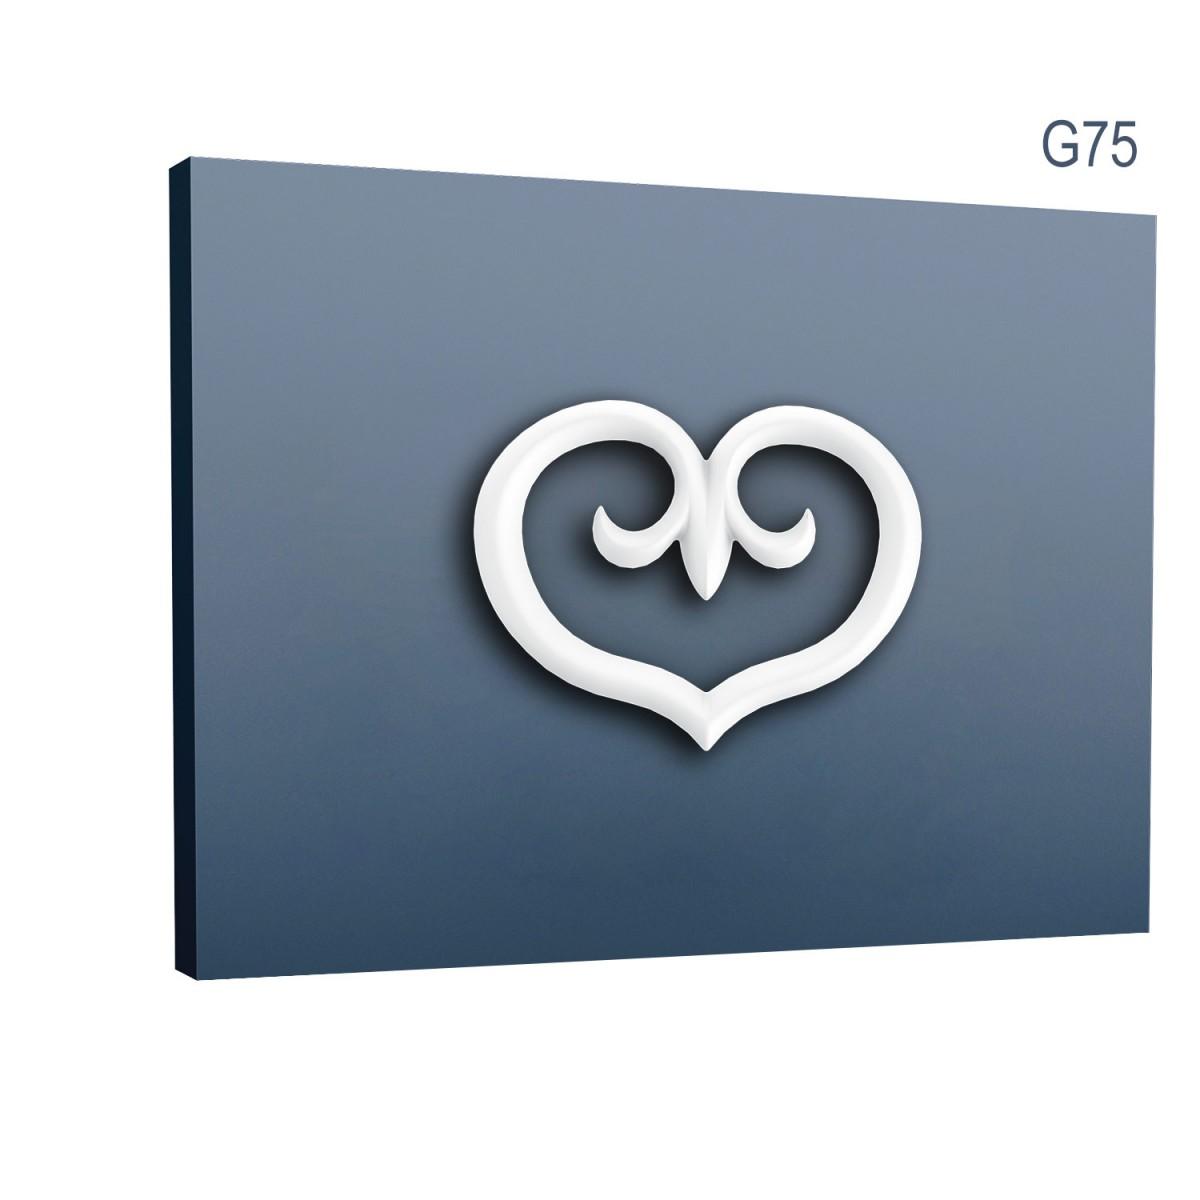 Element Decorativ Ulf Moritz G75, Dimensiuni: 27 X 21 X 1.4 cm, Orac Decor